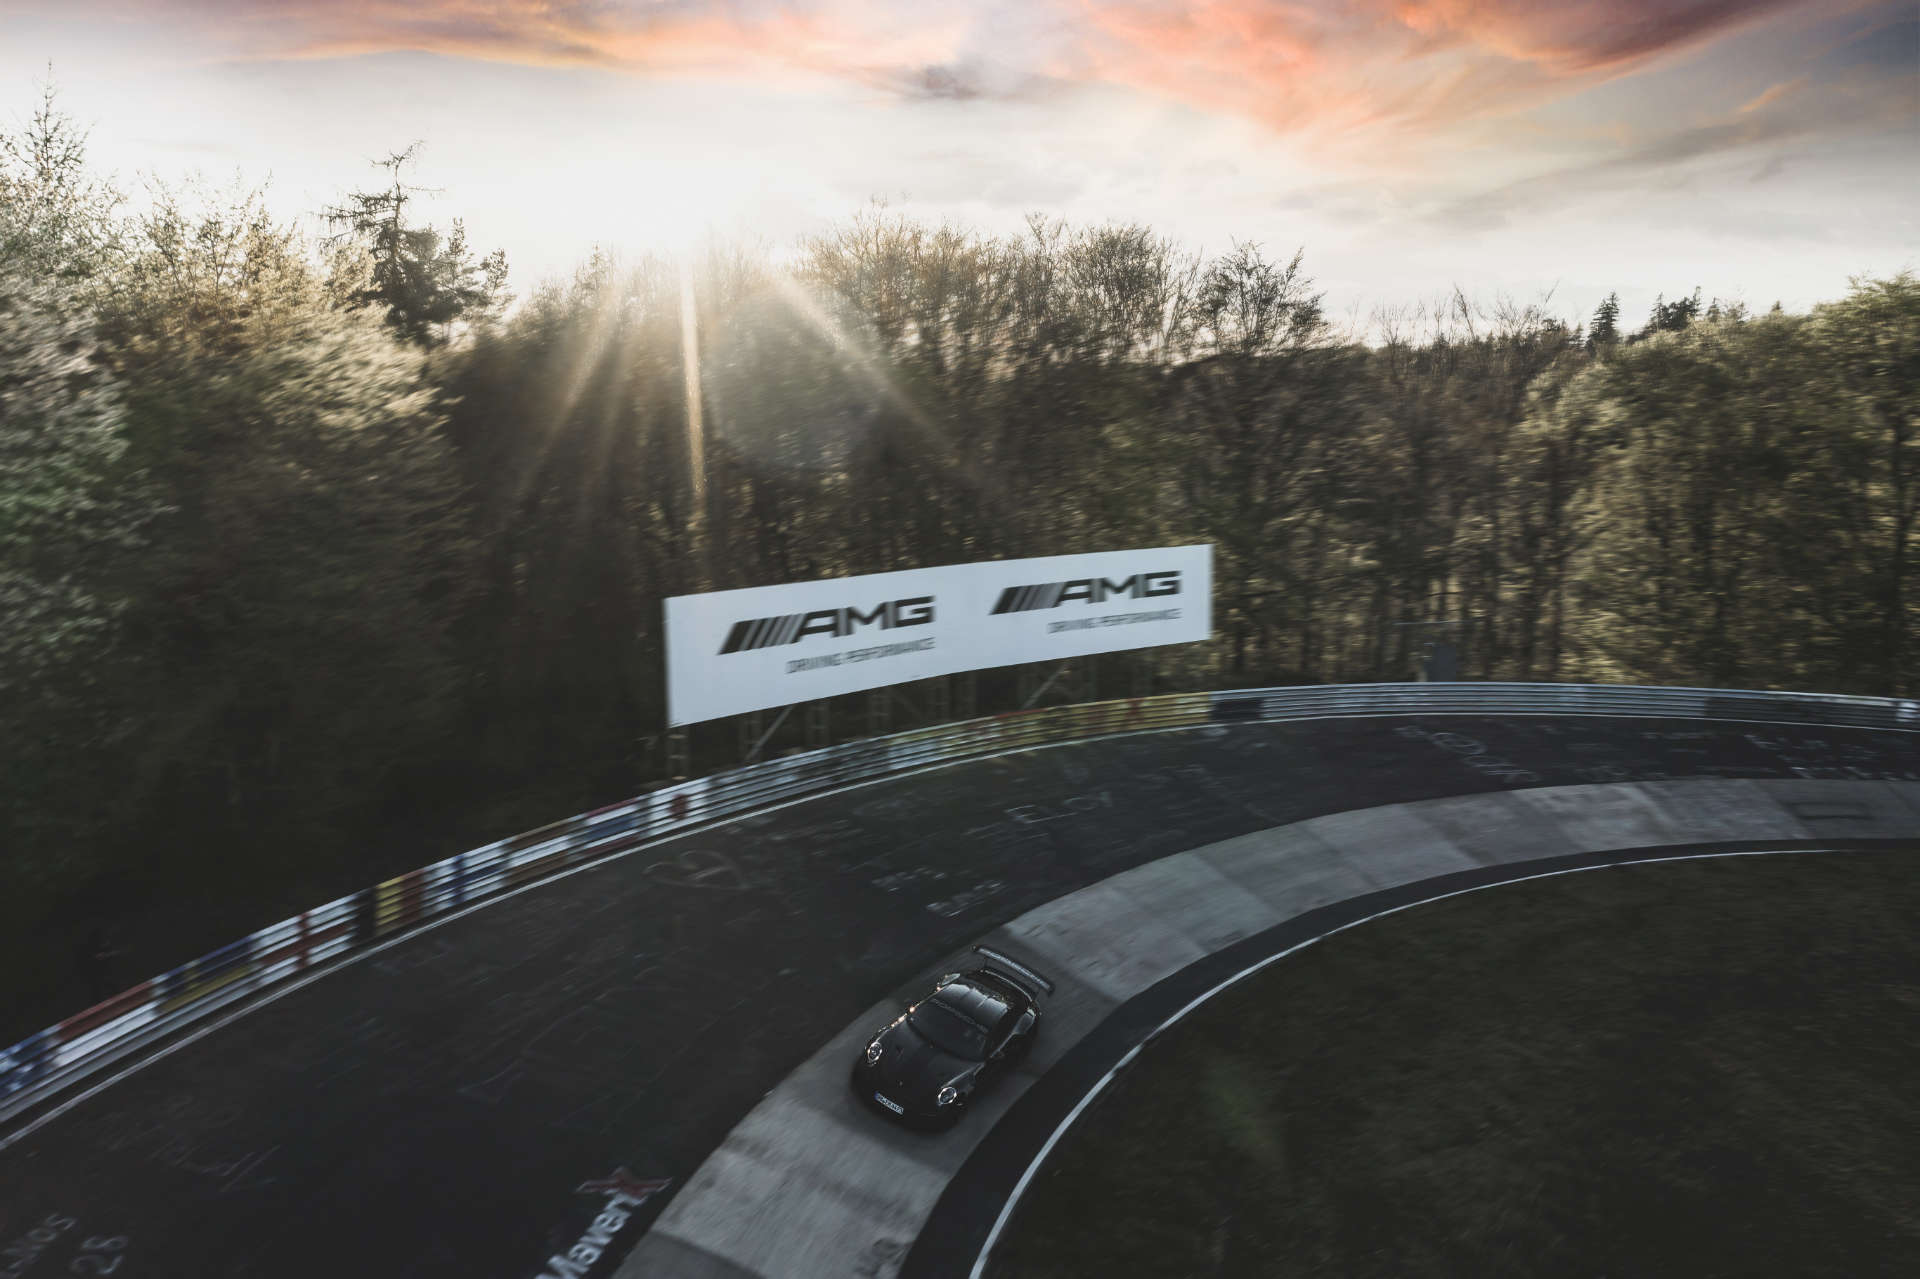 911 GT2 RS Rekordfahrt Nürburgring Sonne